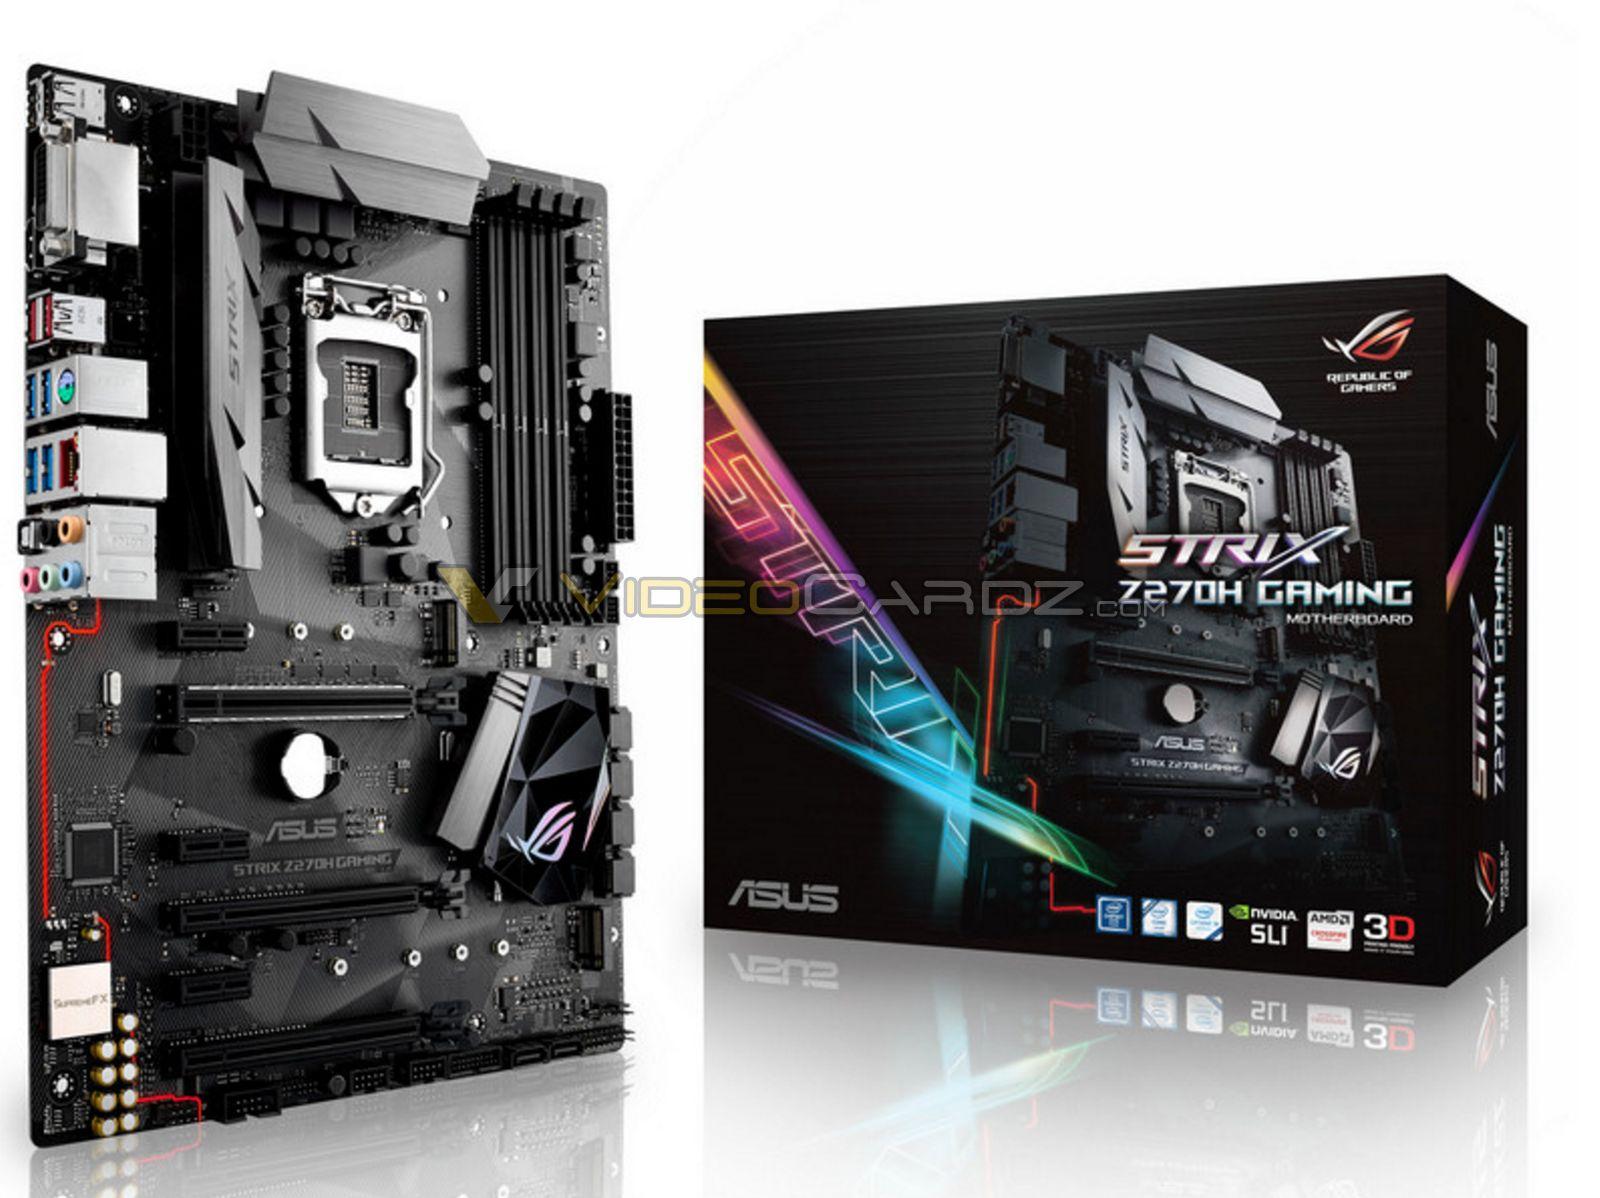 Asus Announces Z270 Series Motherboards Motherboard Asush170 Pro Socket 1151 Lga Chipset Intel H170